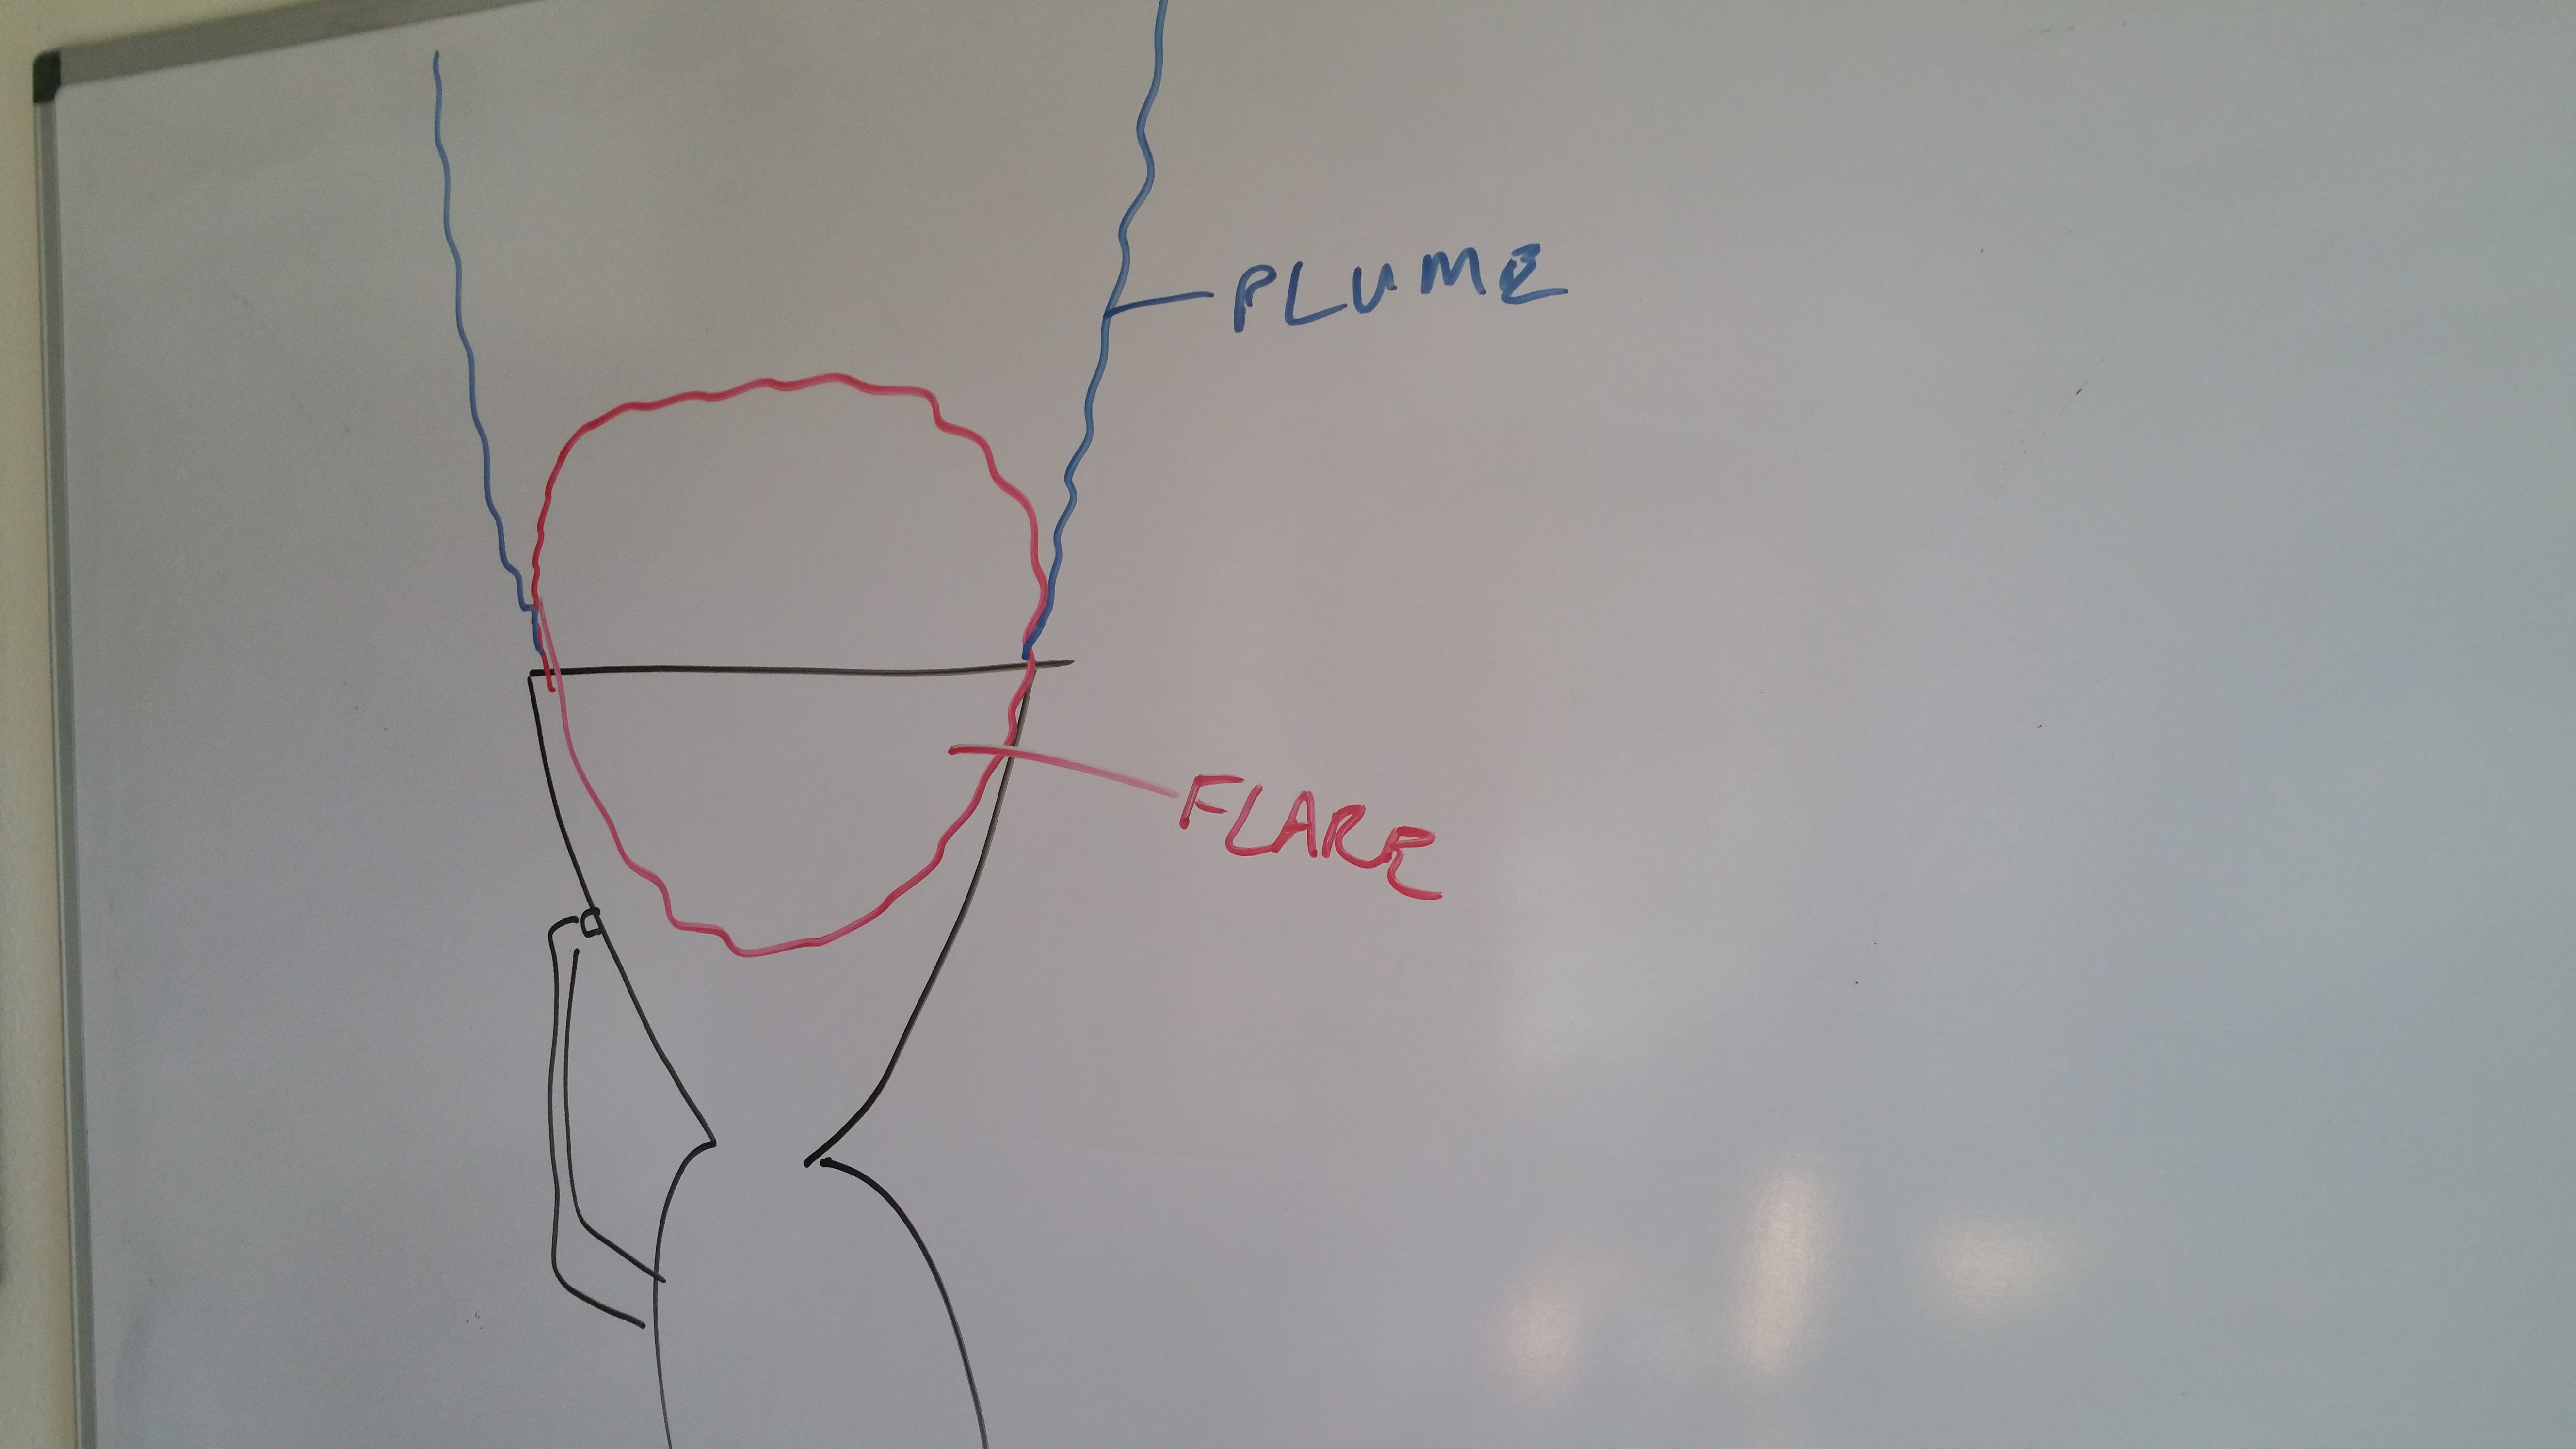 Plume Flare Alignment image